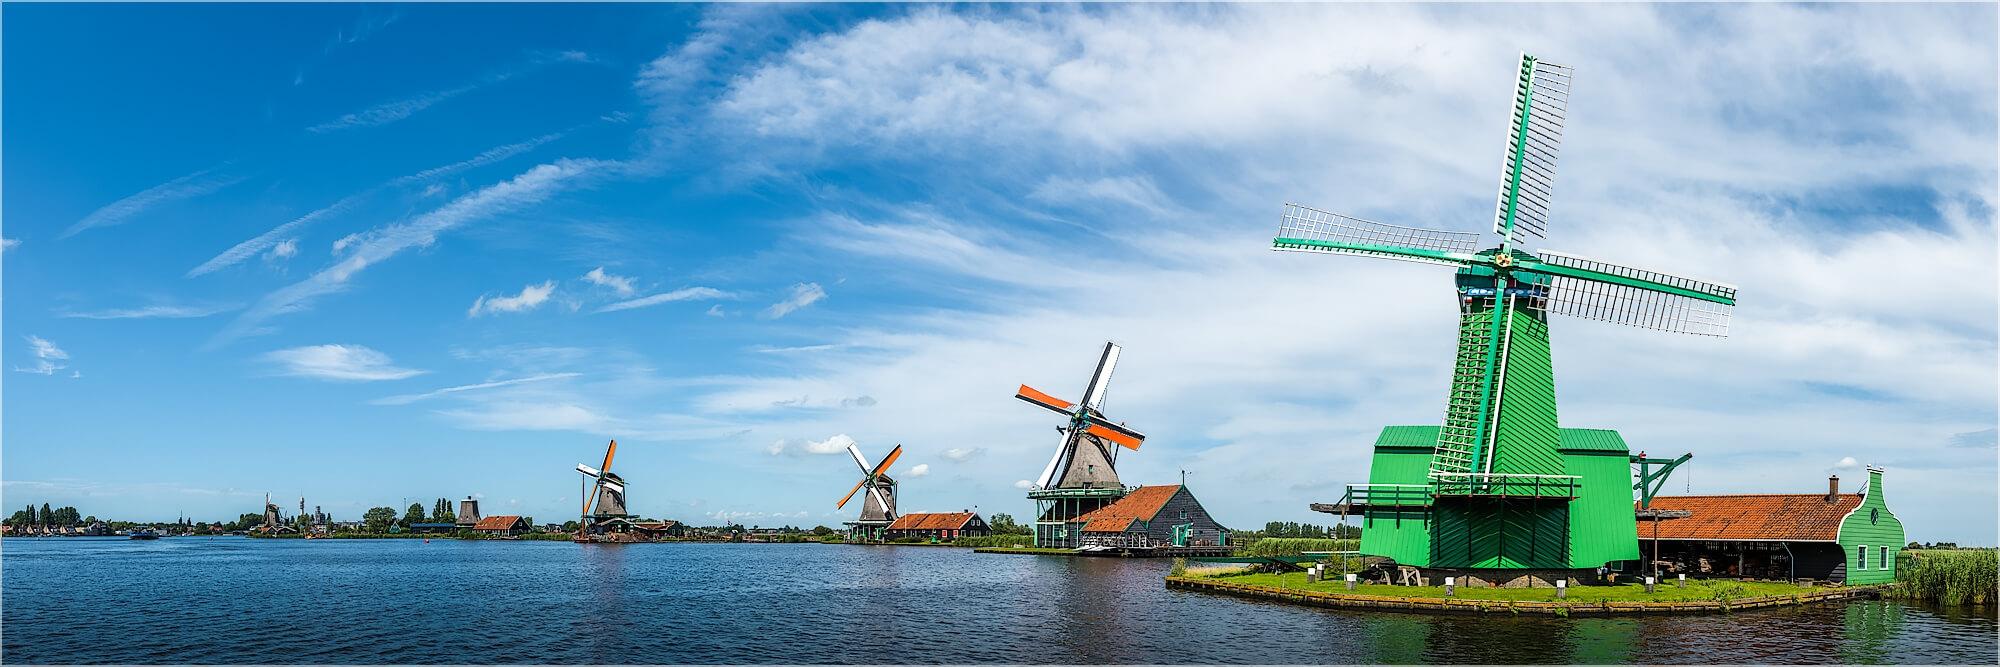 Panoramafoto Windmühlen bei Zaandam Holland